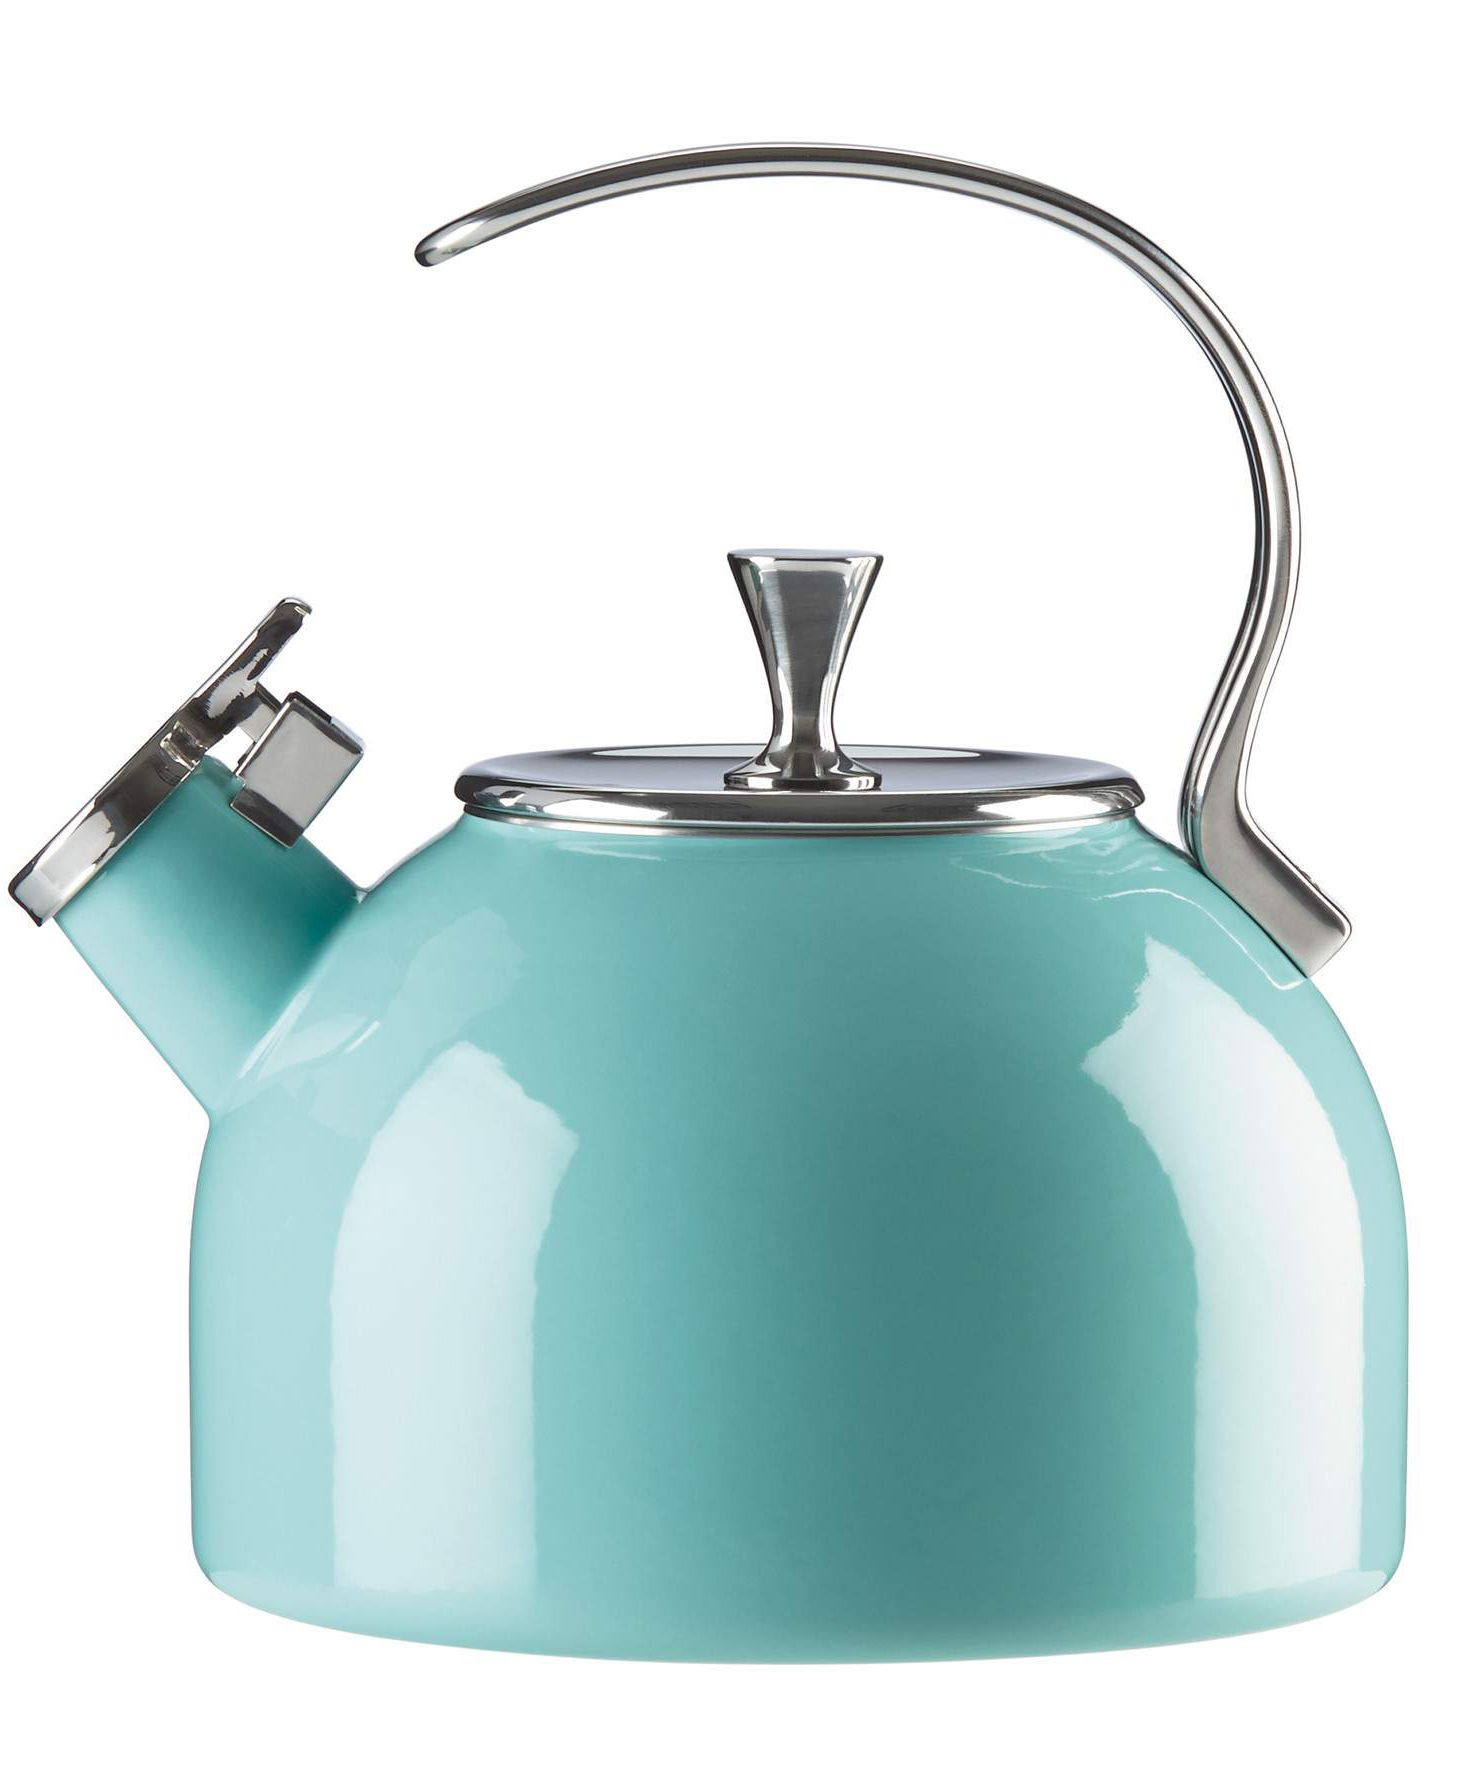 Kate Spade Turquoise Tea Kettle | I Want That! | Pinterest | Kettle ...